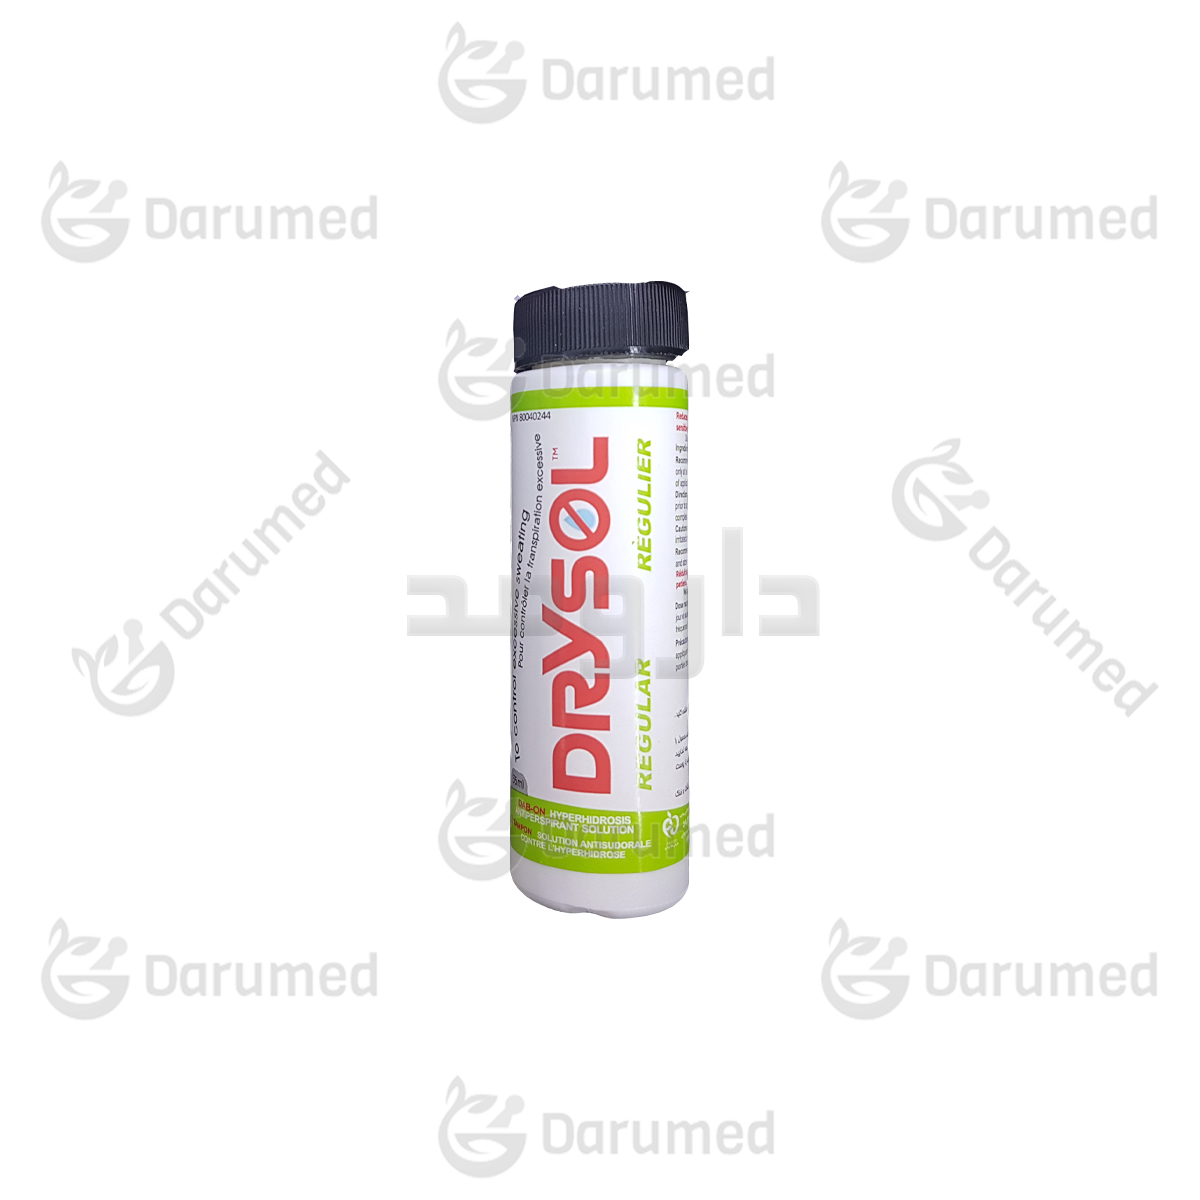 رایسول-پوست-حساس